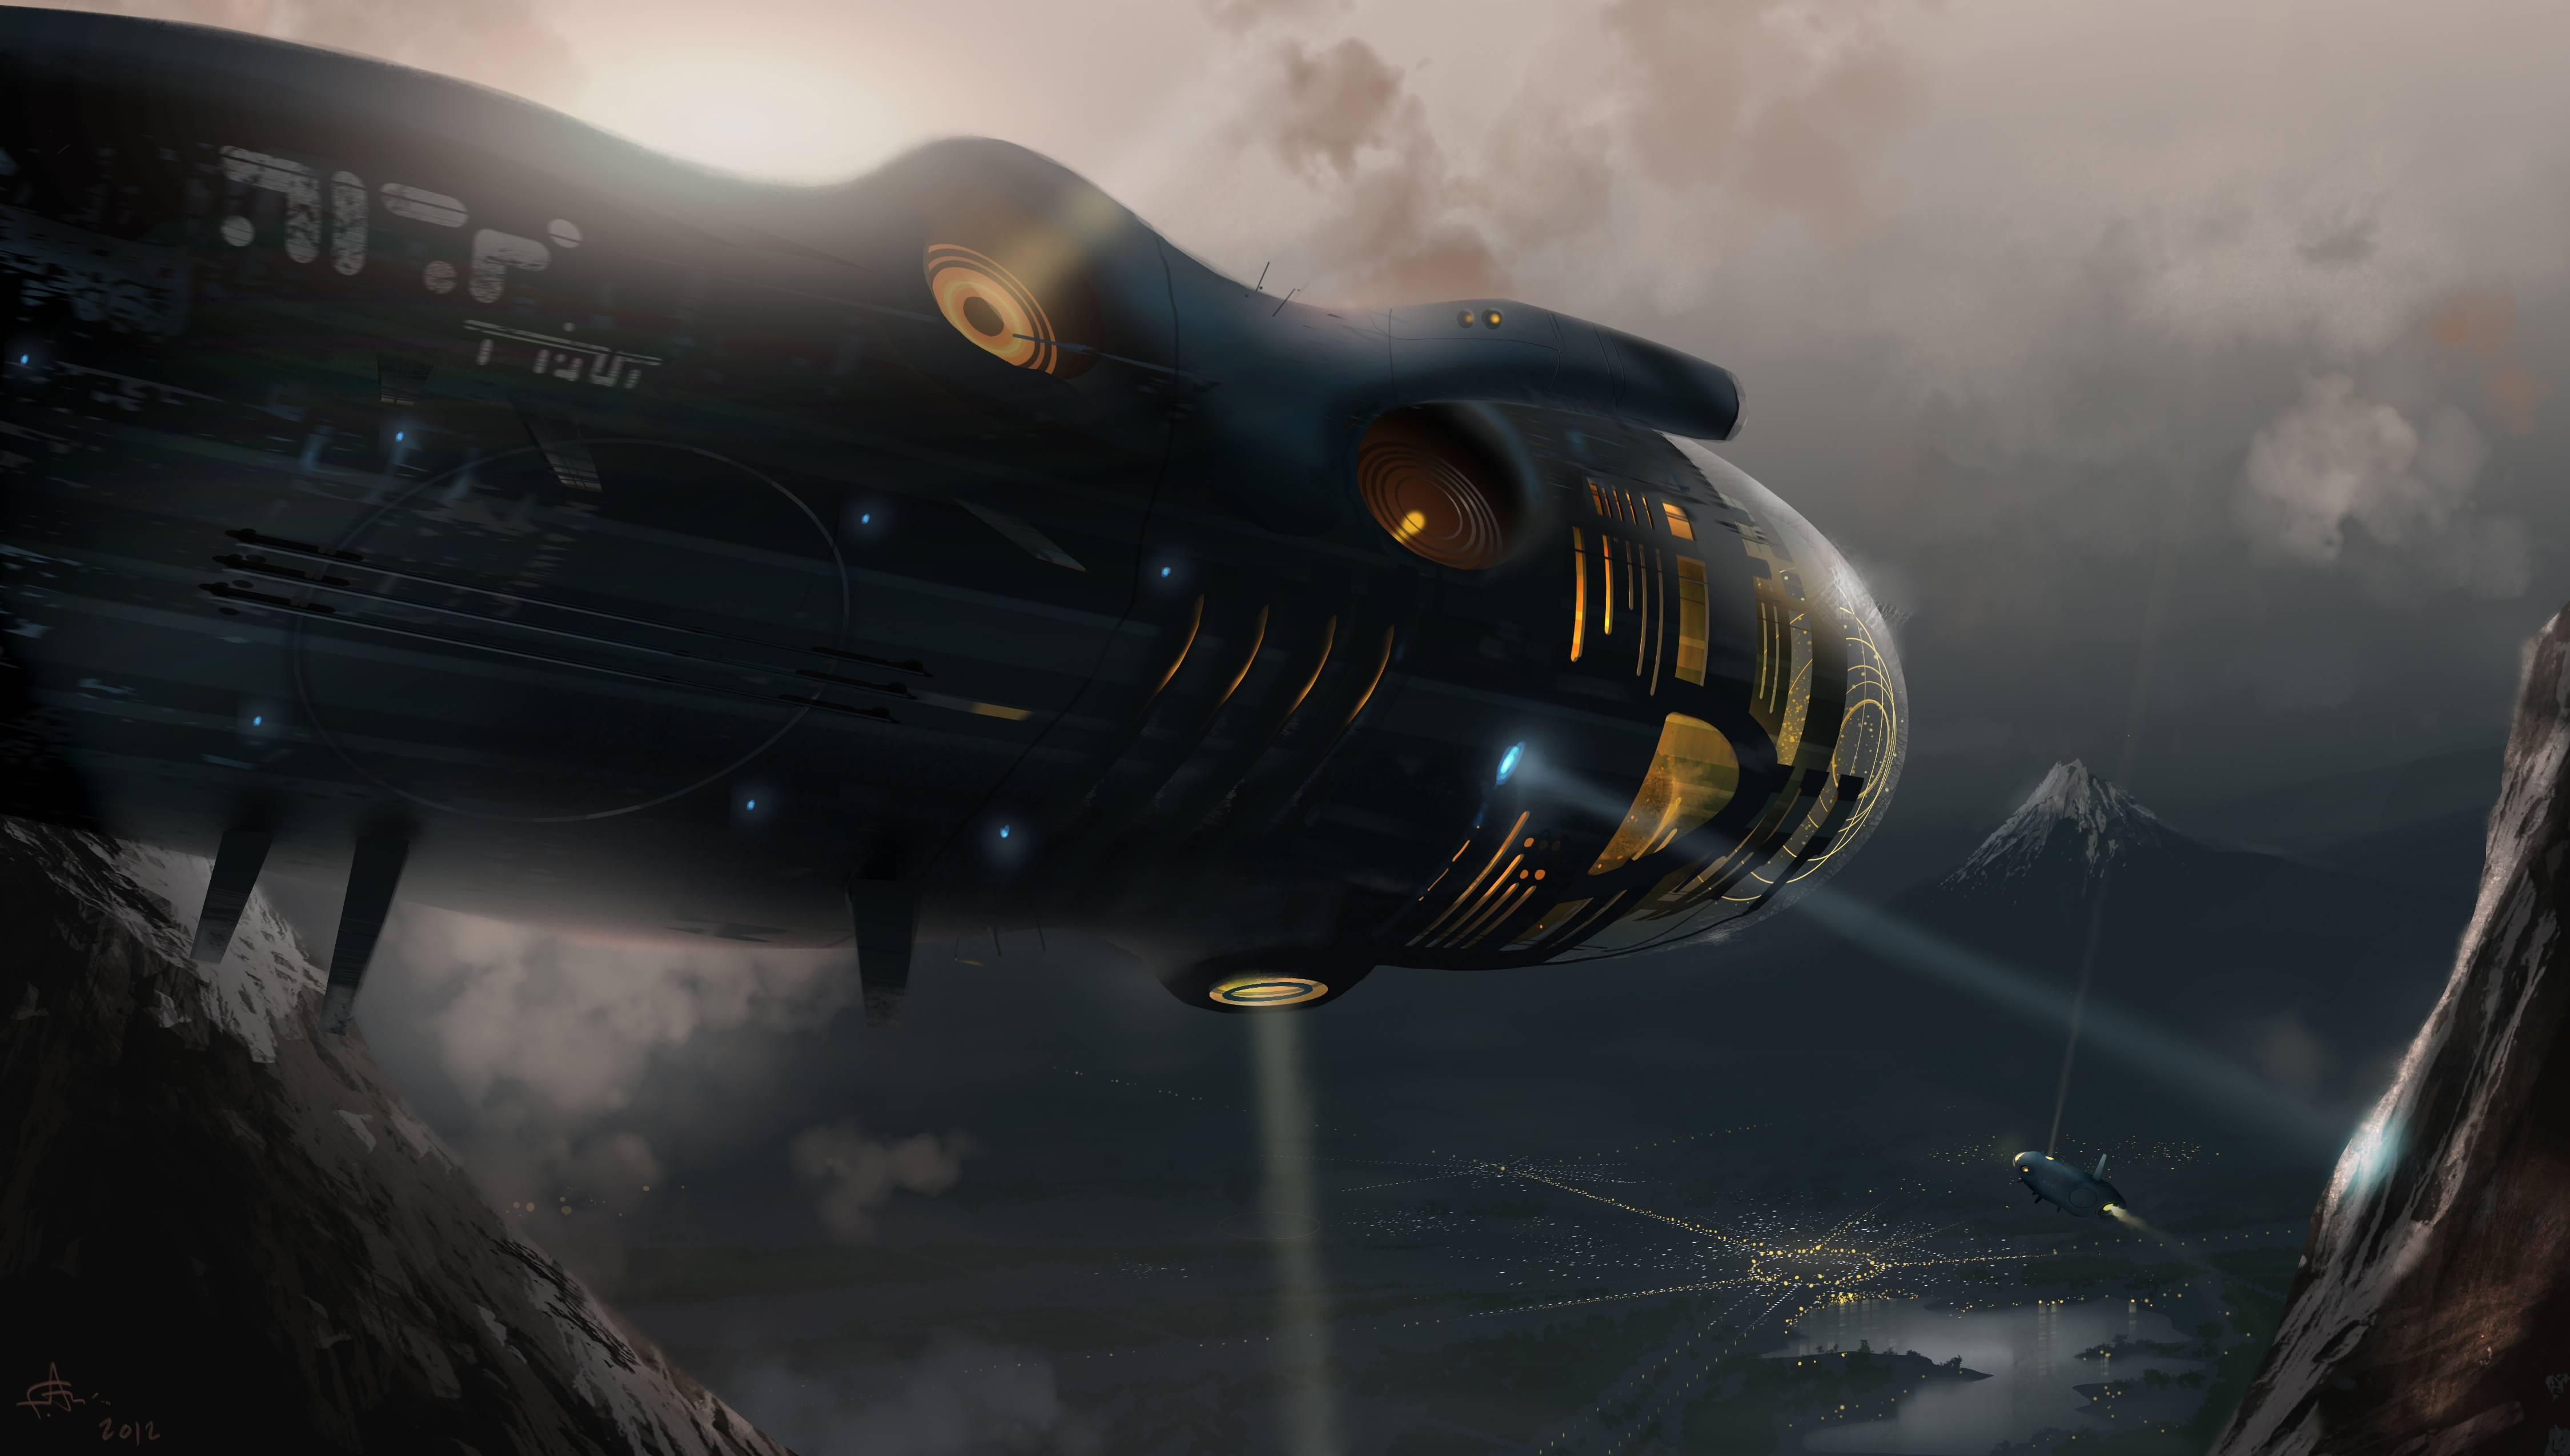 Technics spaceship wallpaper | 4500x2550 | 82531 | WallpaperUP